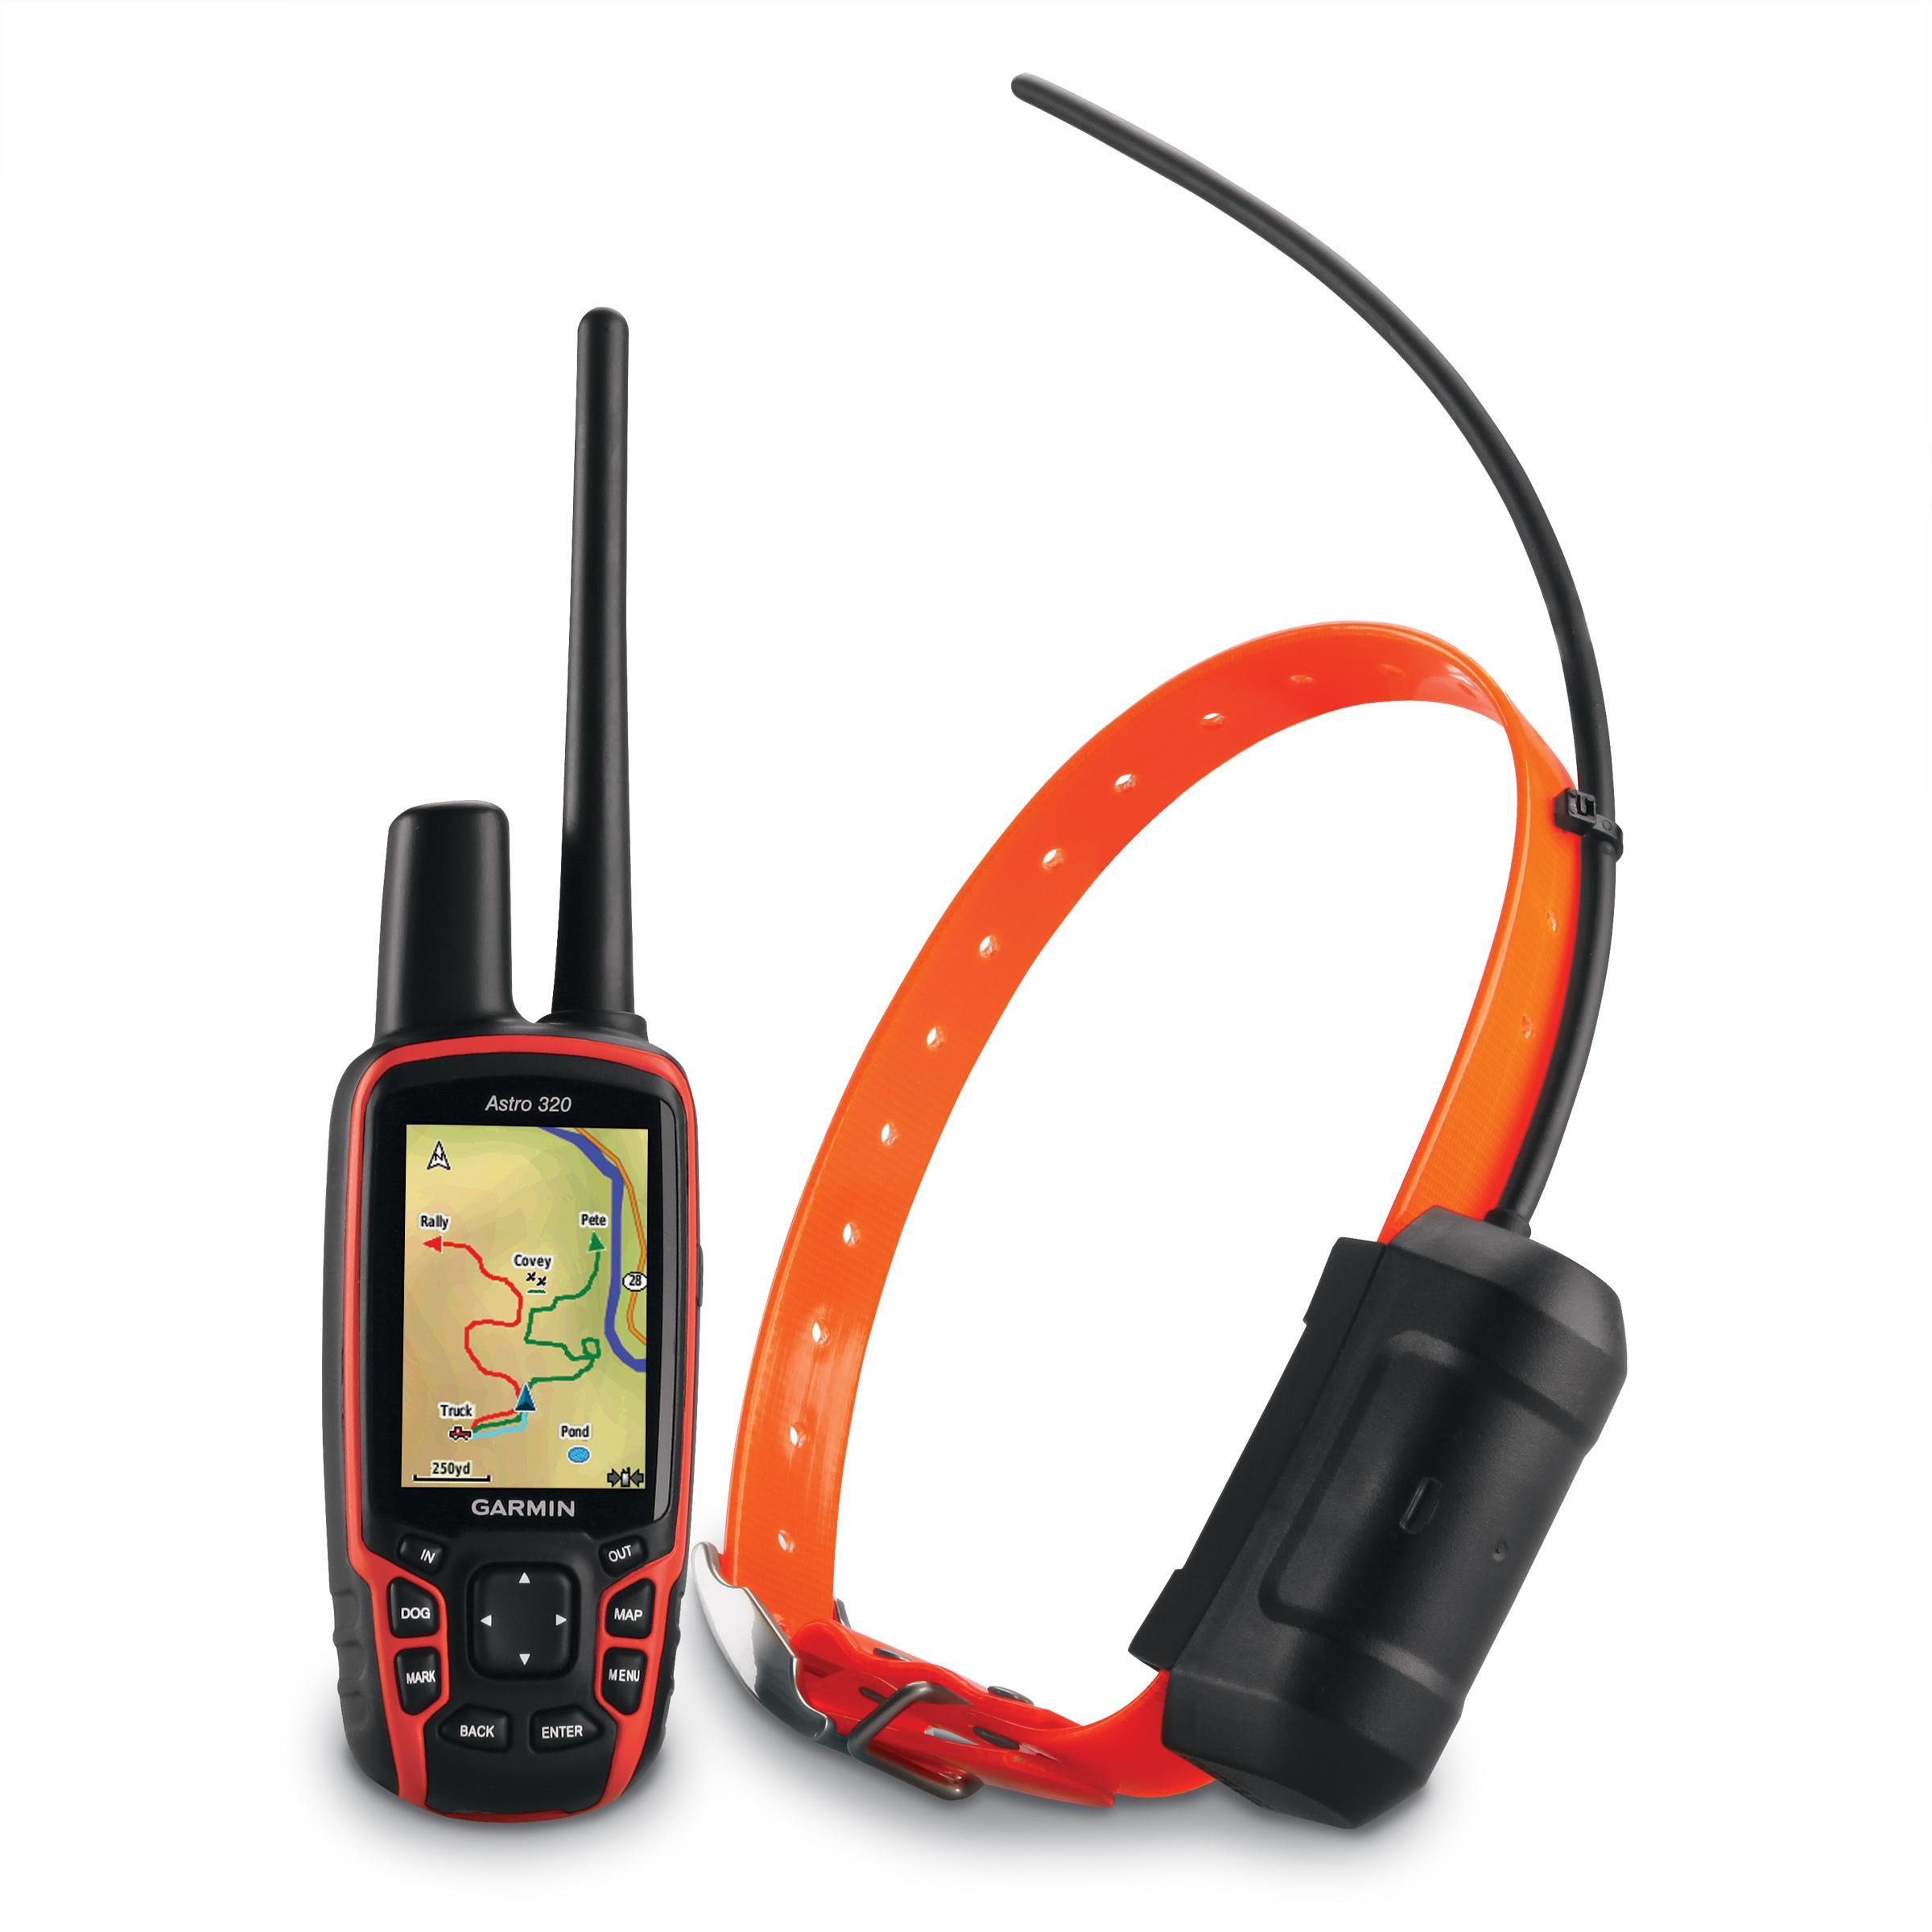 Garmin Tracking System >> Amazon.com: Garmin Astro 320 T5 Dog GPS Bundle: Cell Phones & Accessories